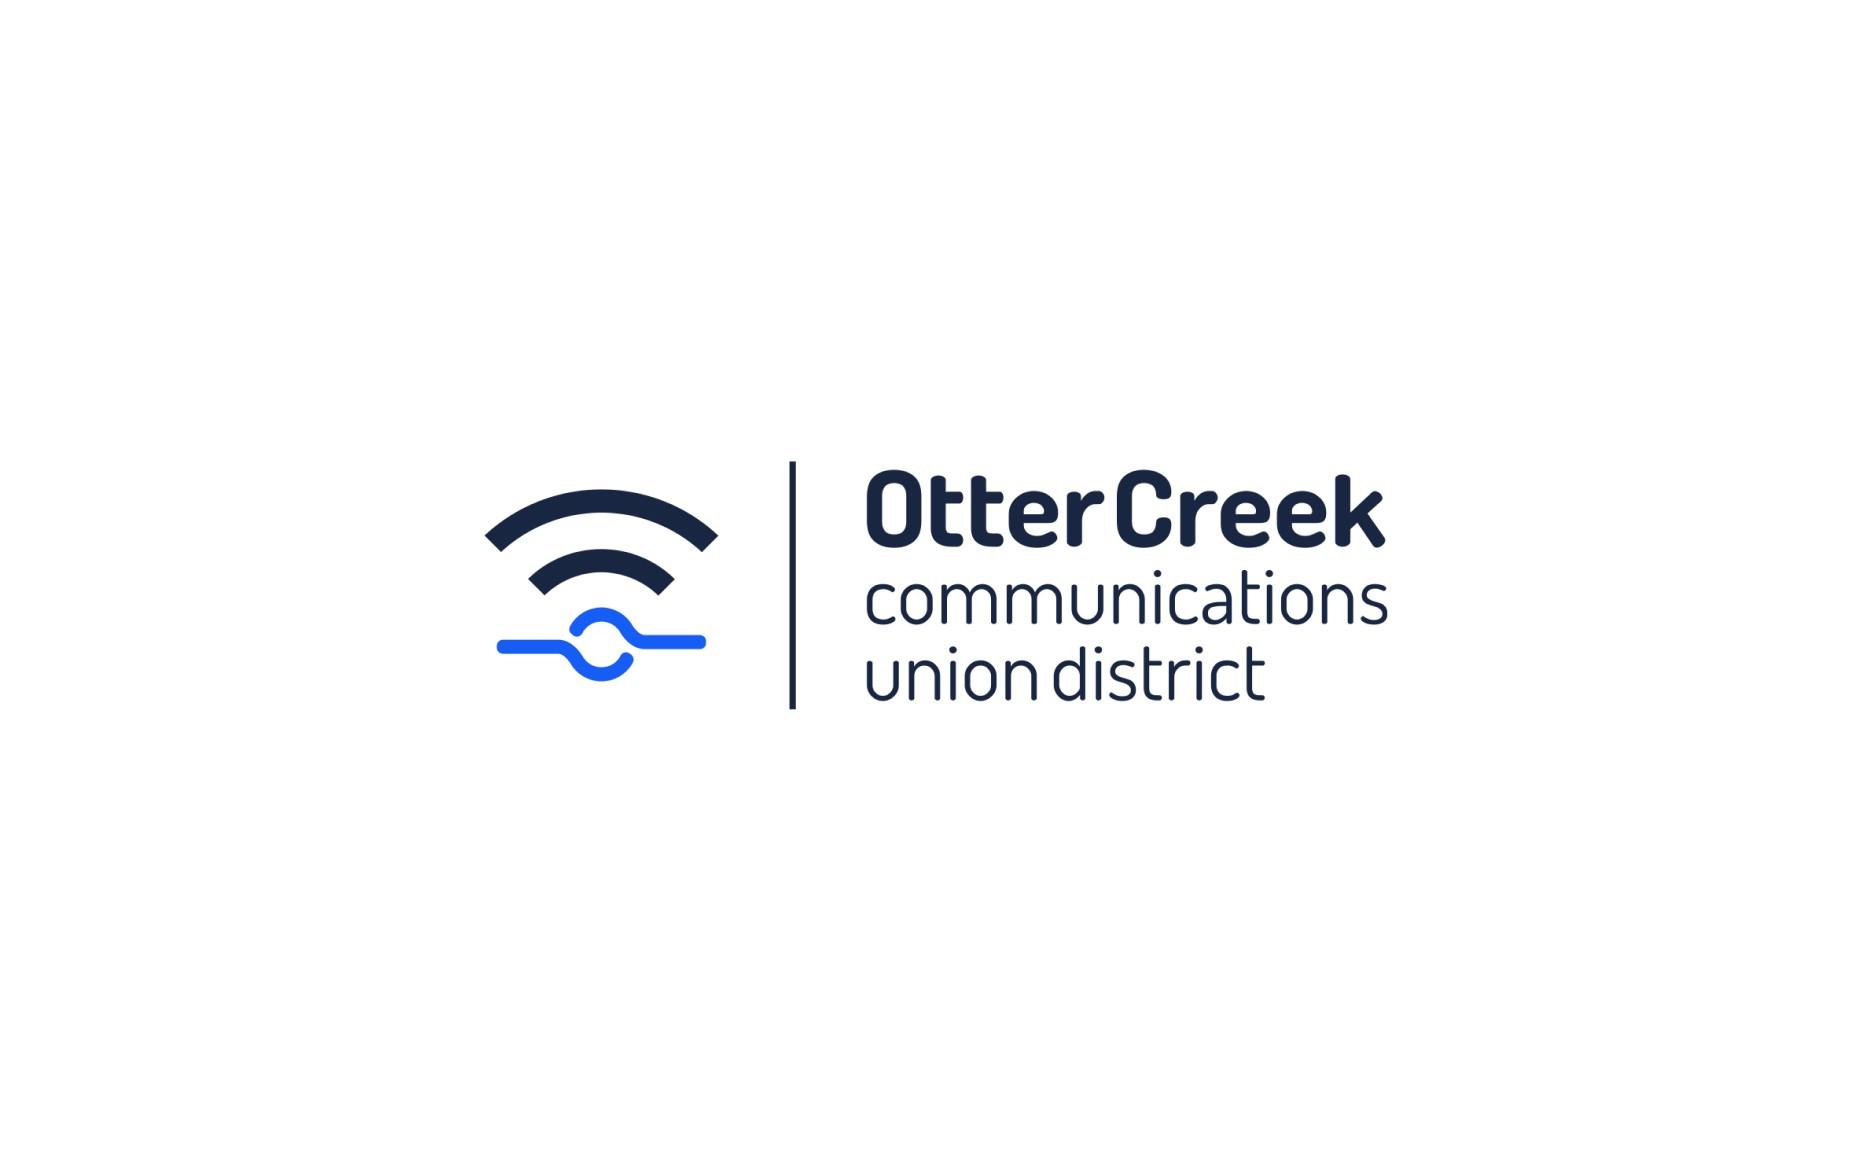 Otter Creek Communications Union District